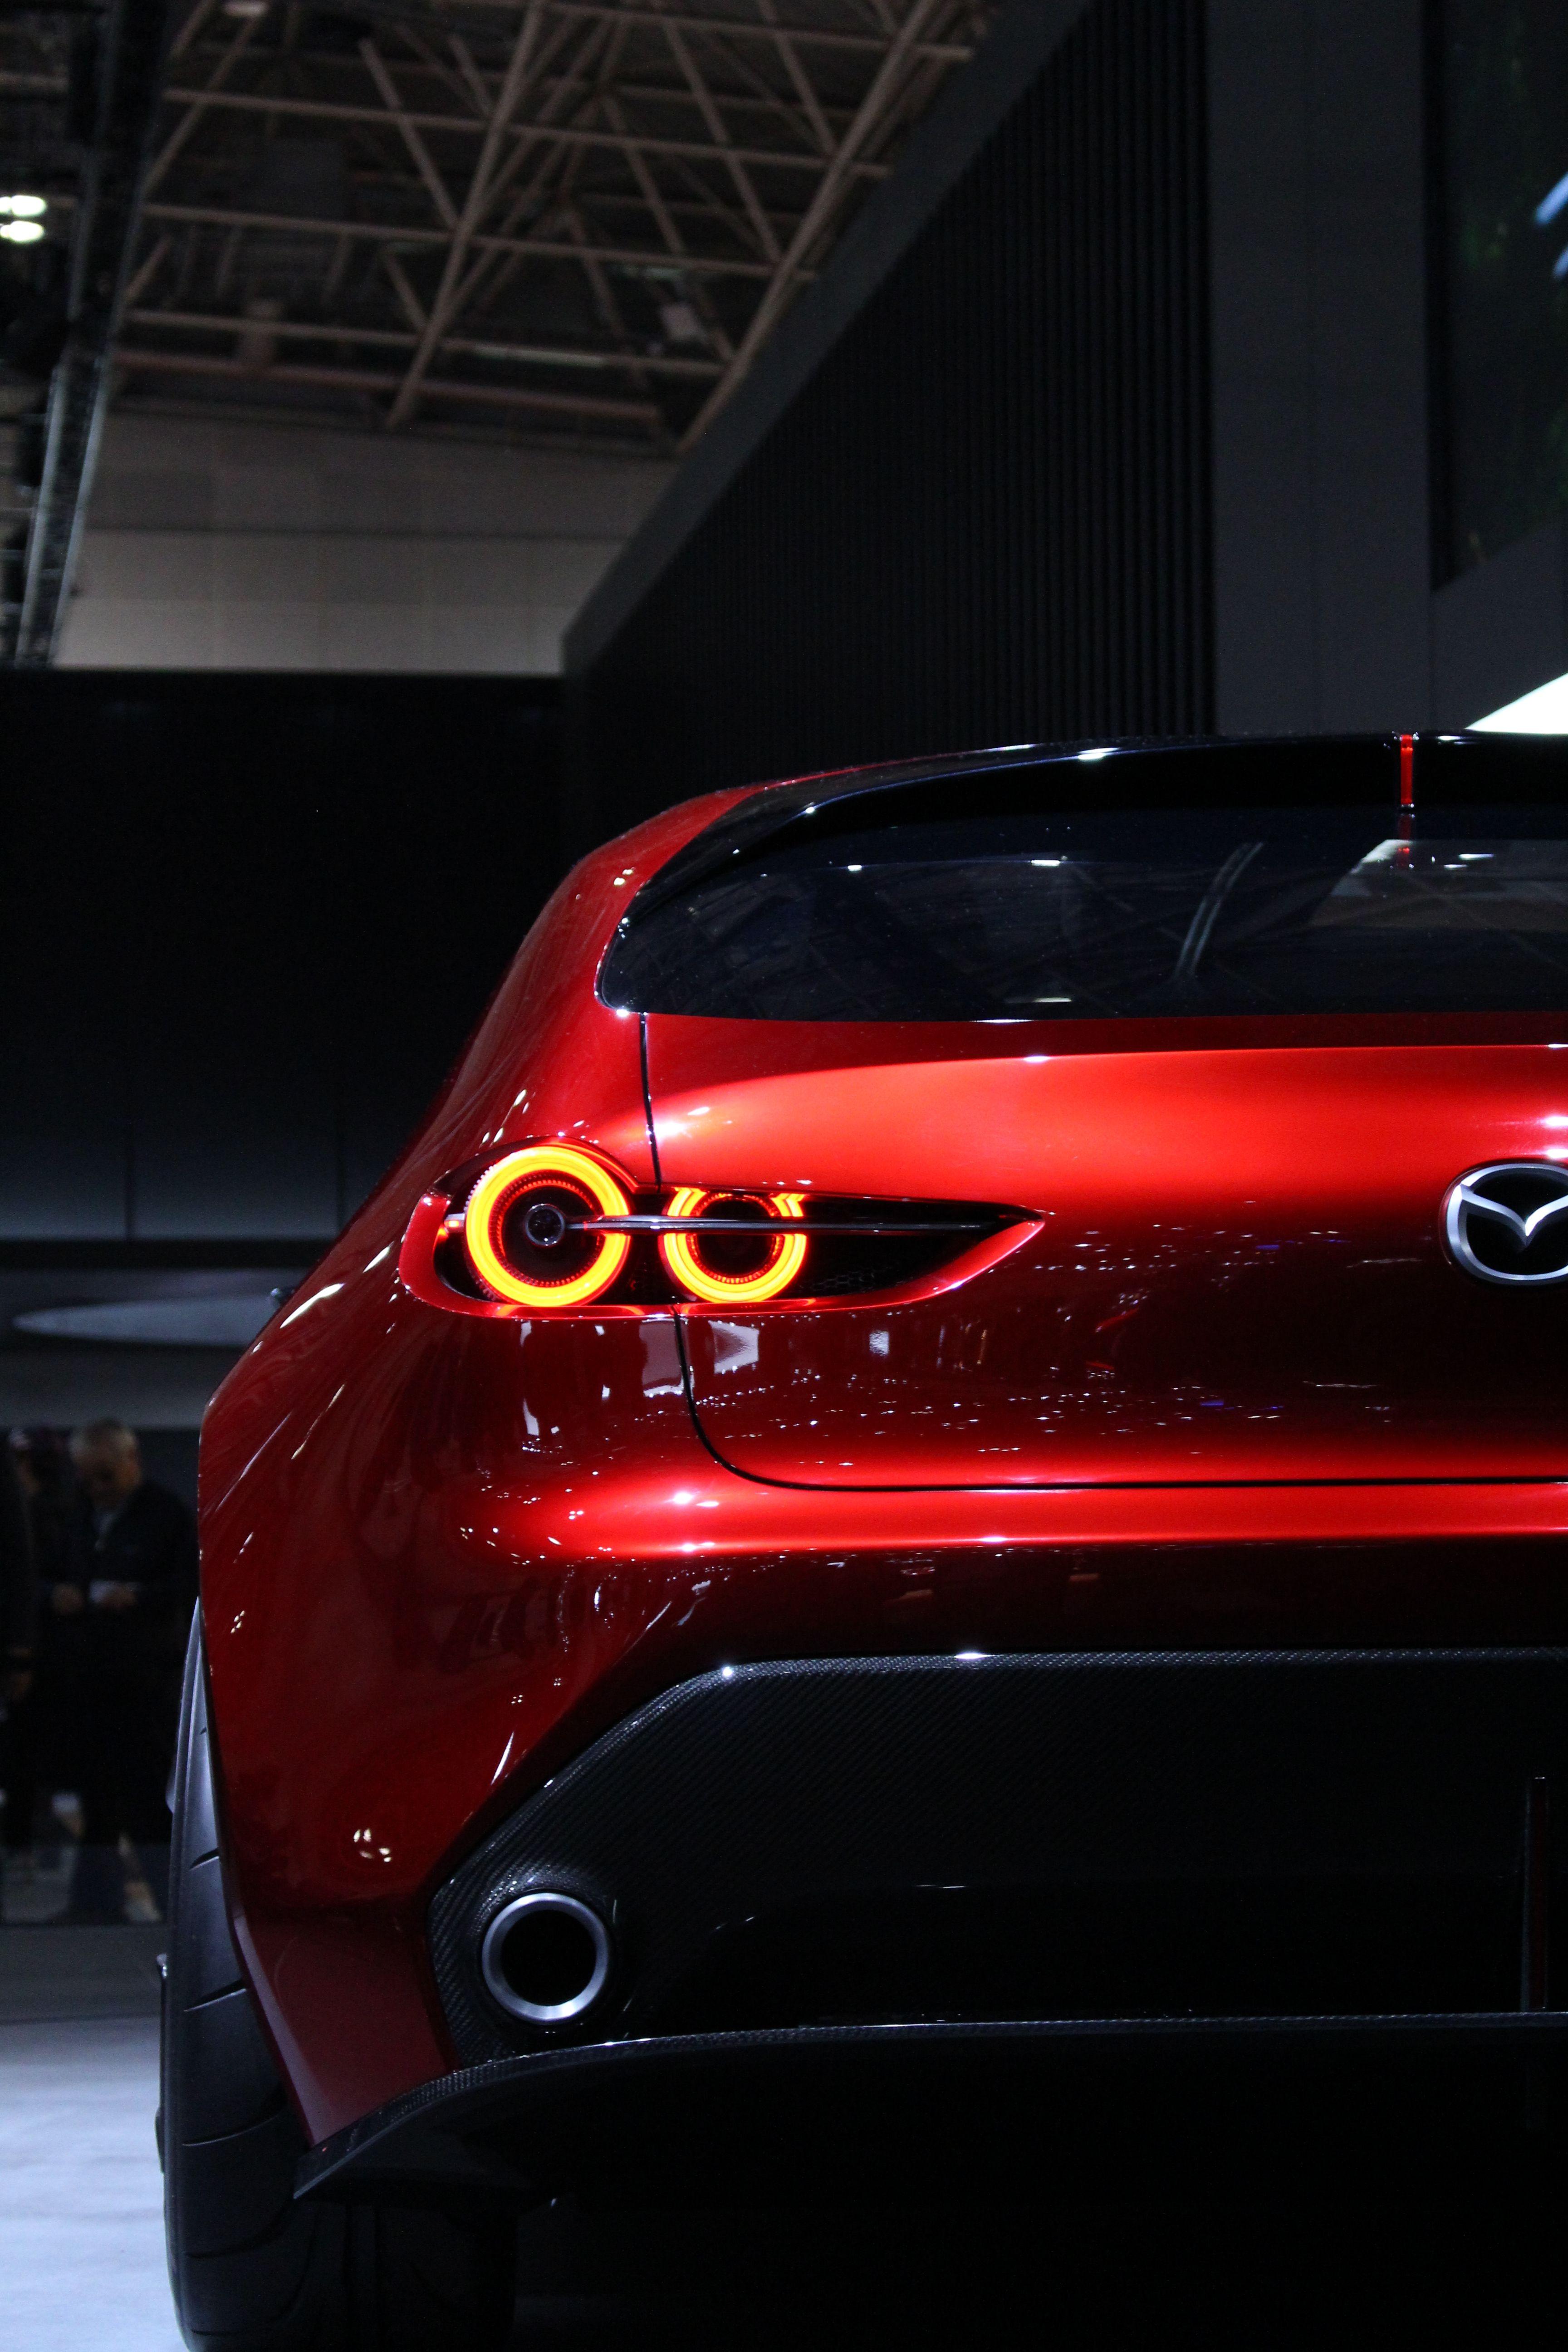 Mazda KAI CONCEPT 2017 | Auto | Pinterest | Mazda and Cars